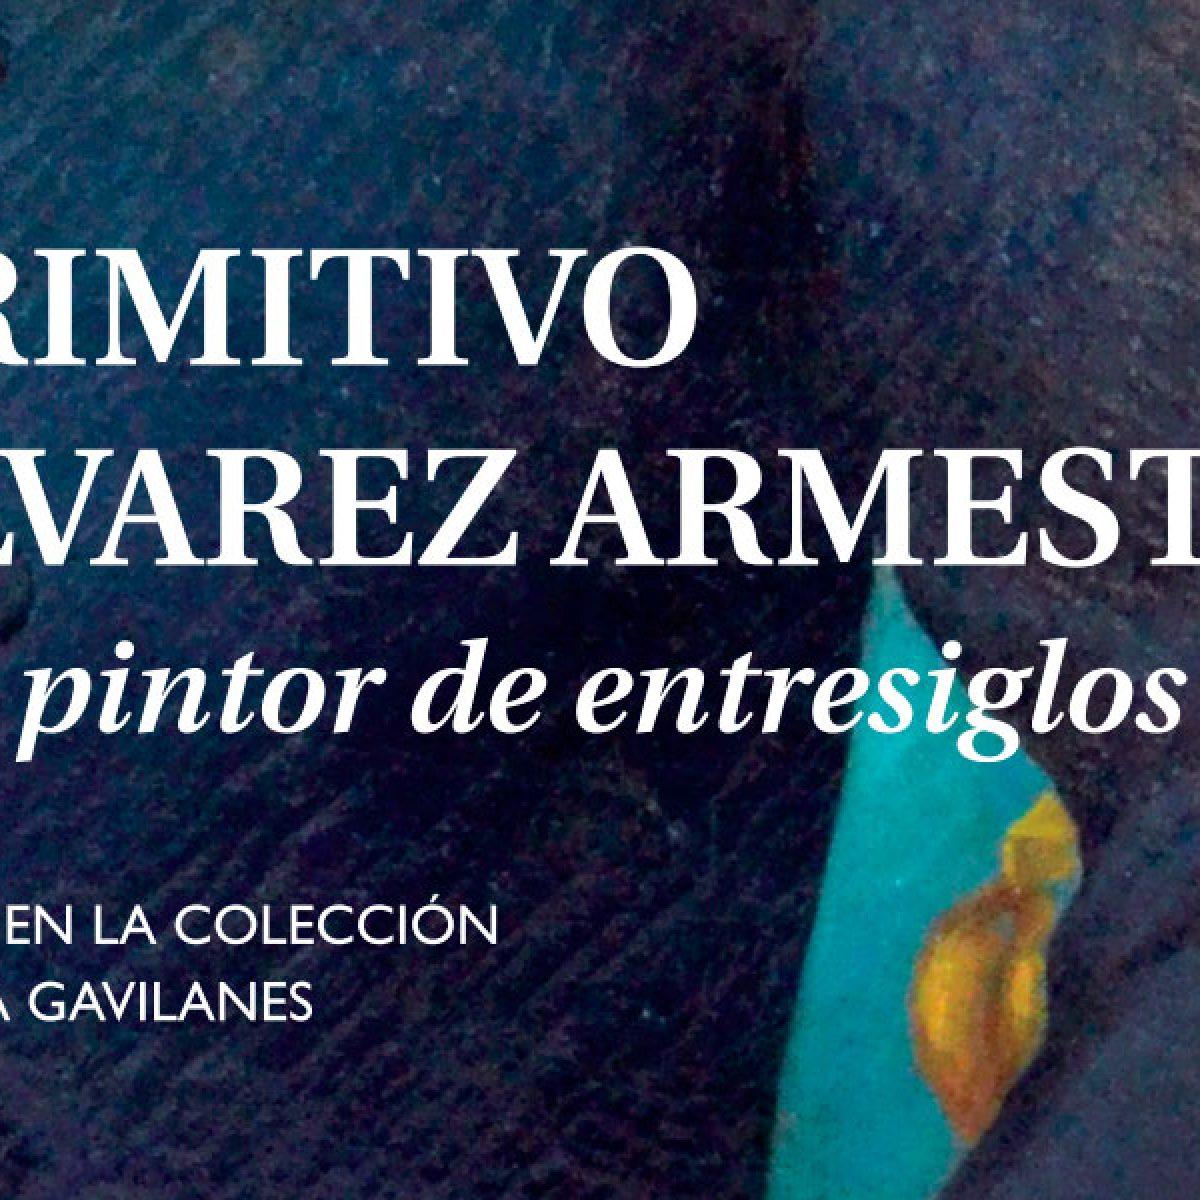 Un pintor de entresiglos - Primitivo Alvarez Armesto